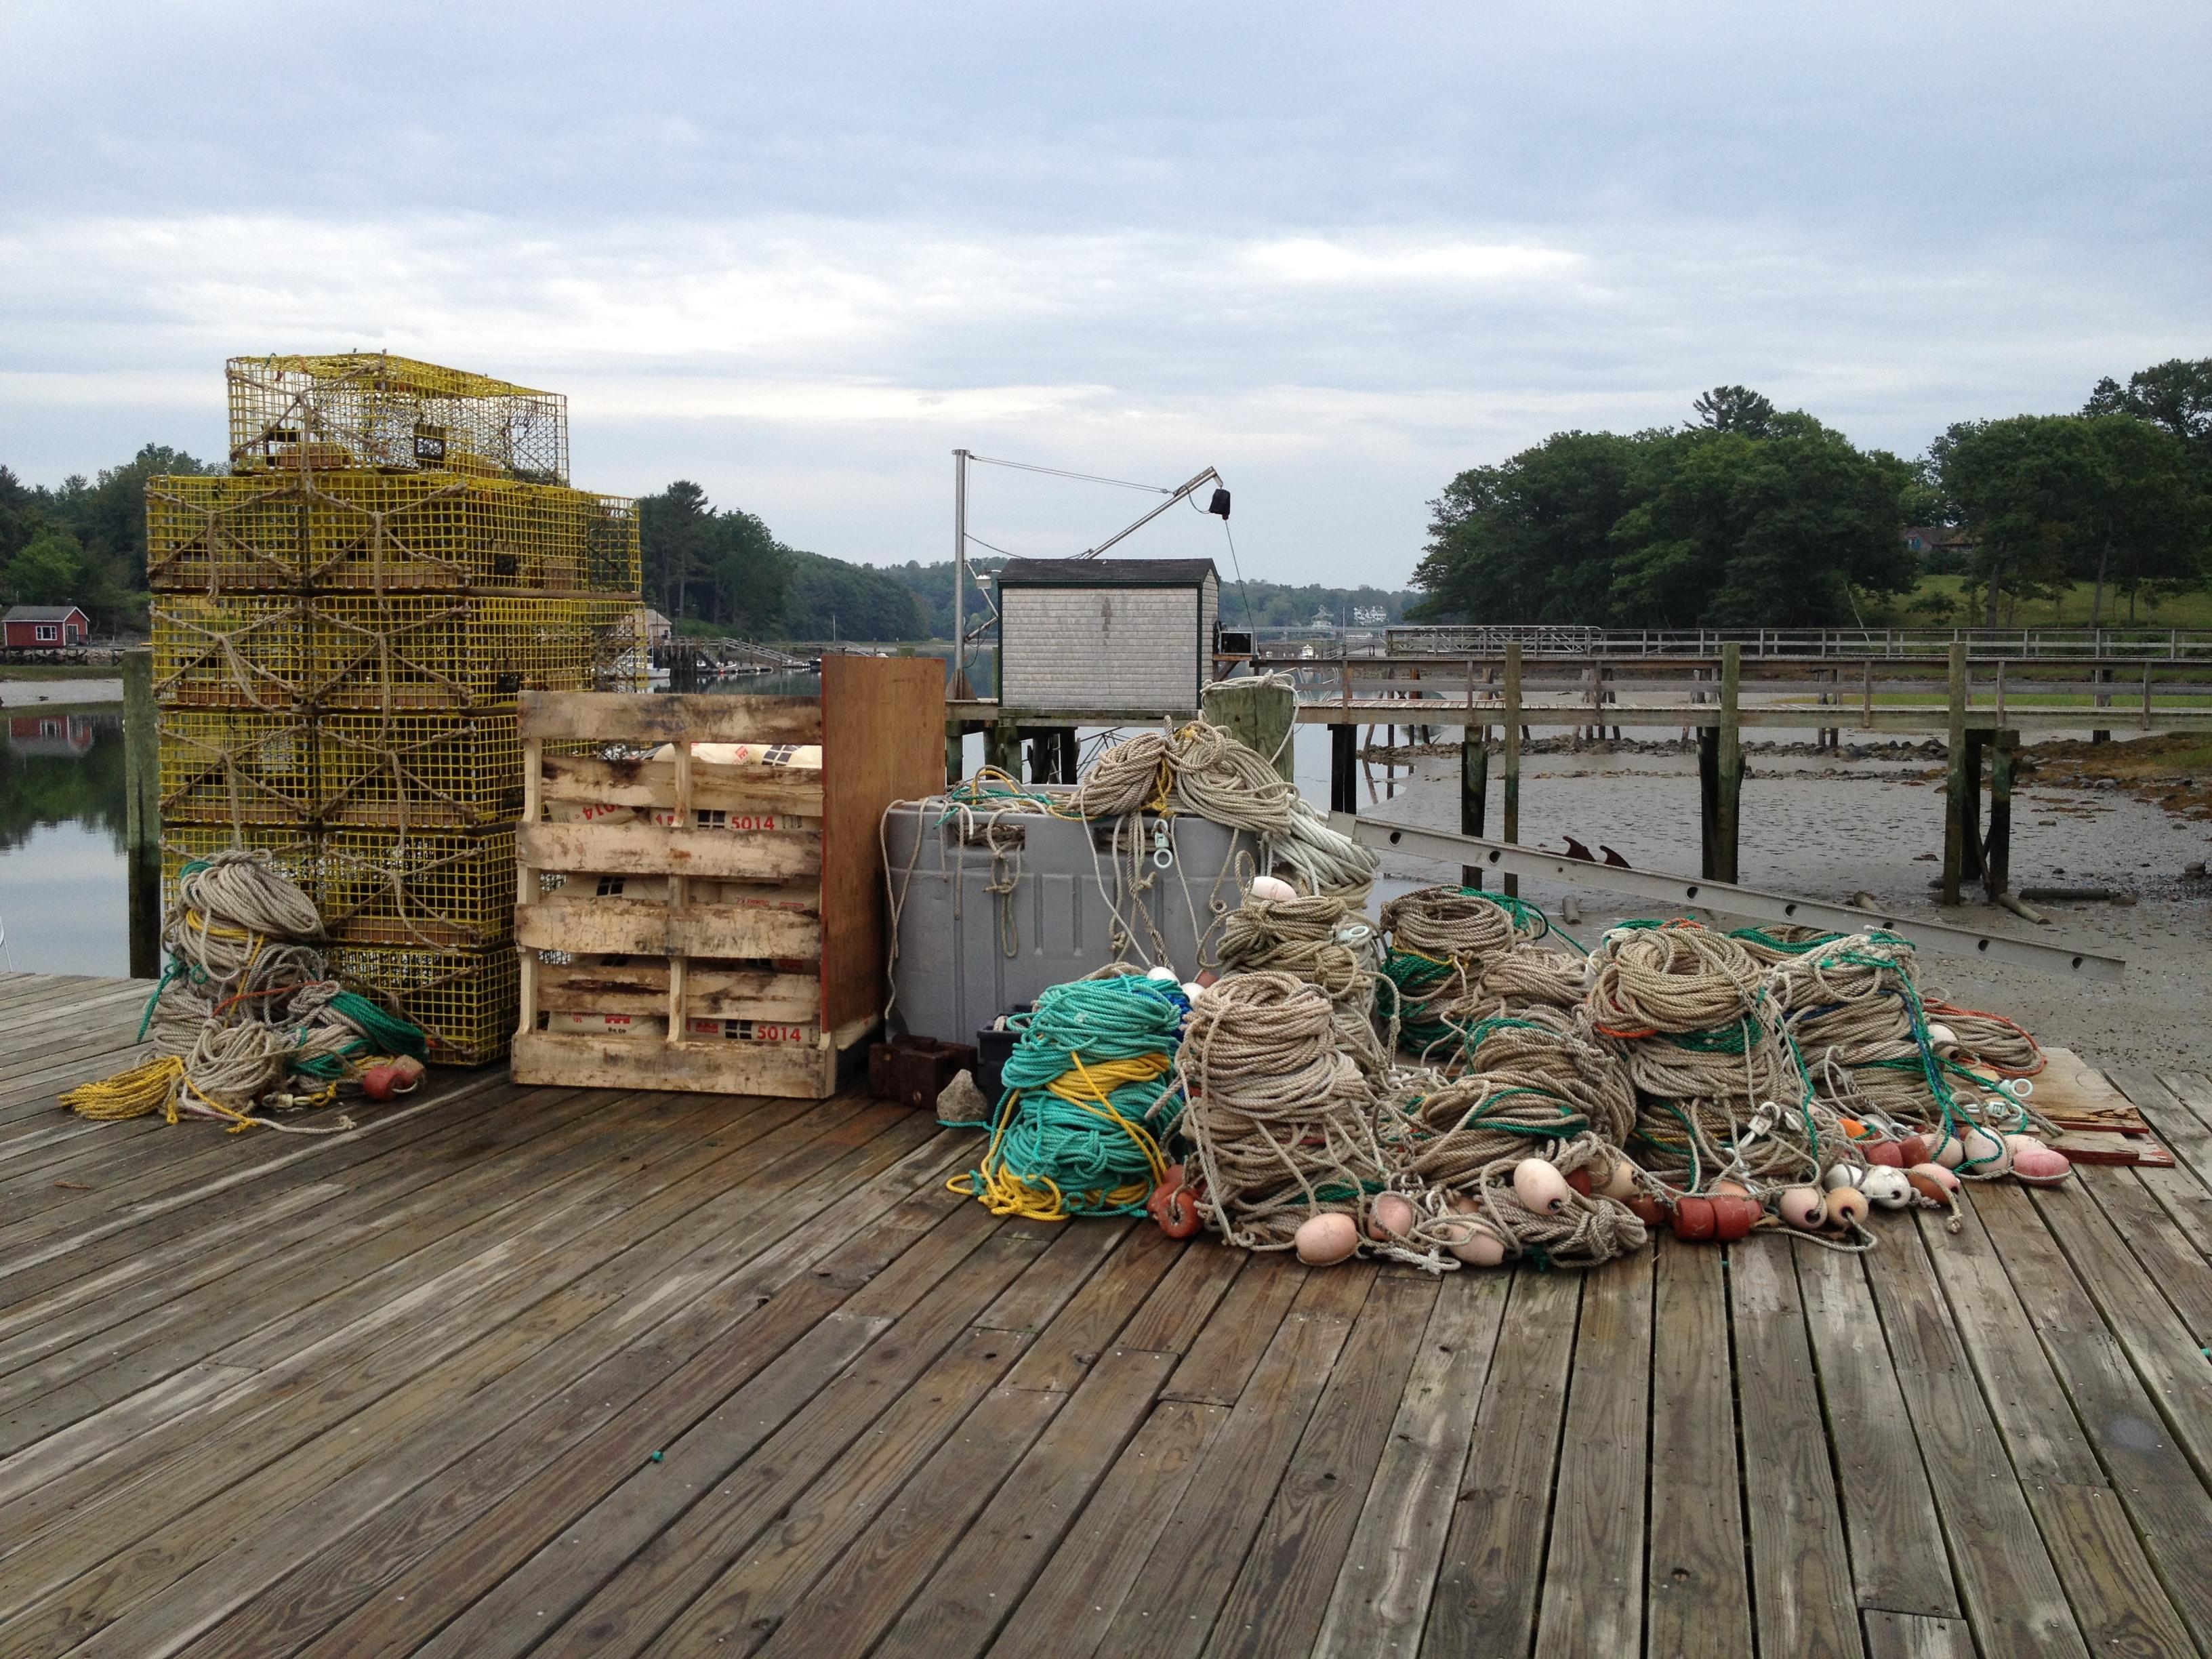 Lobster traps on Sewall's Bridge